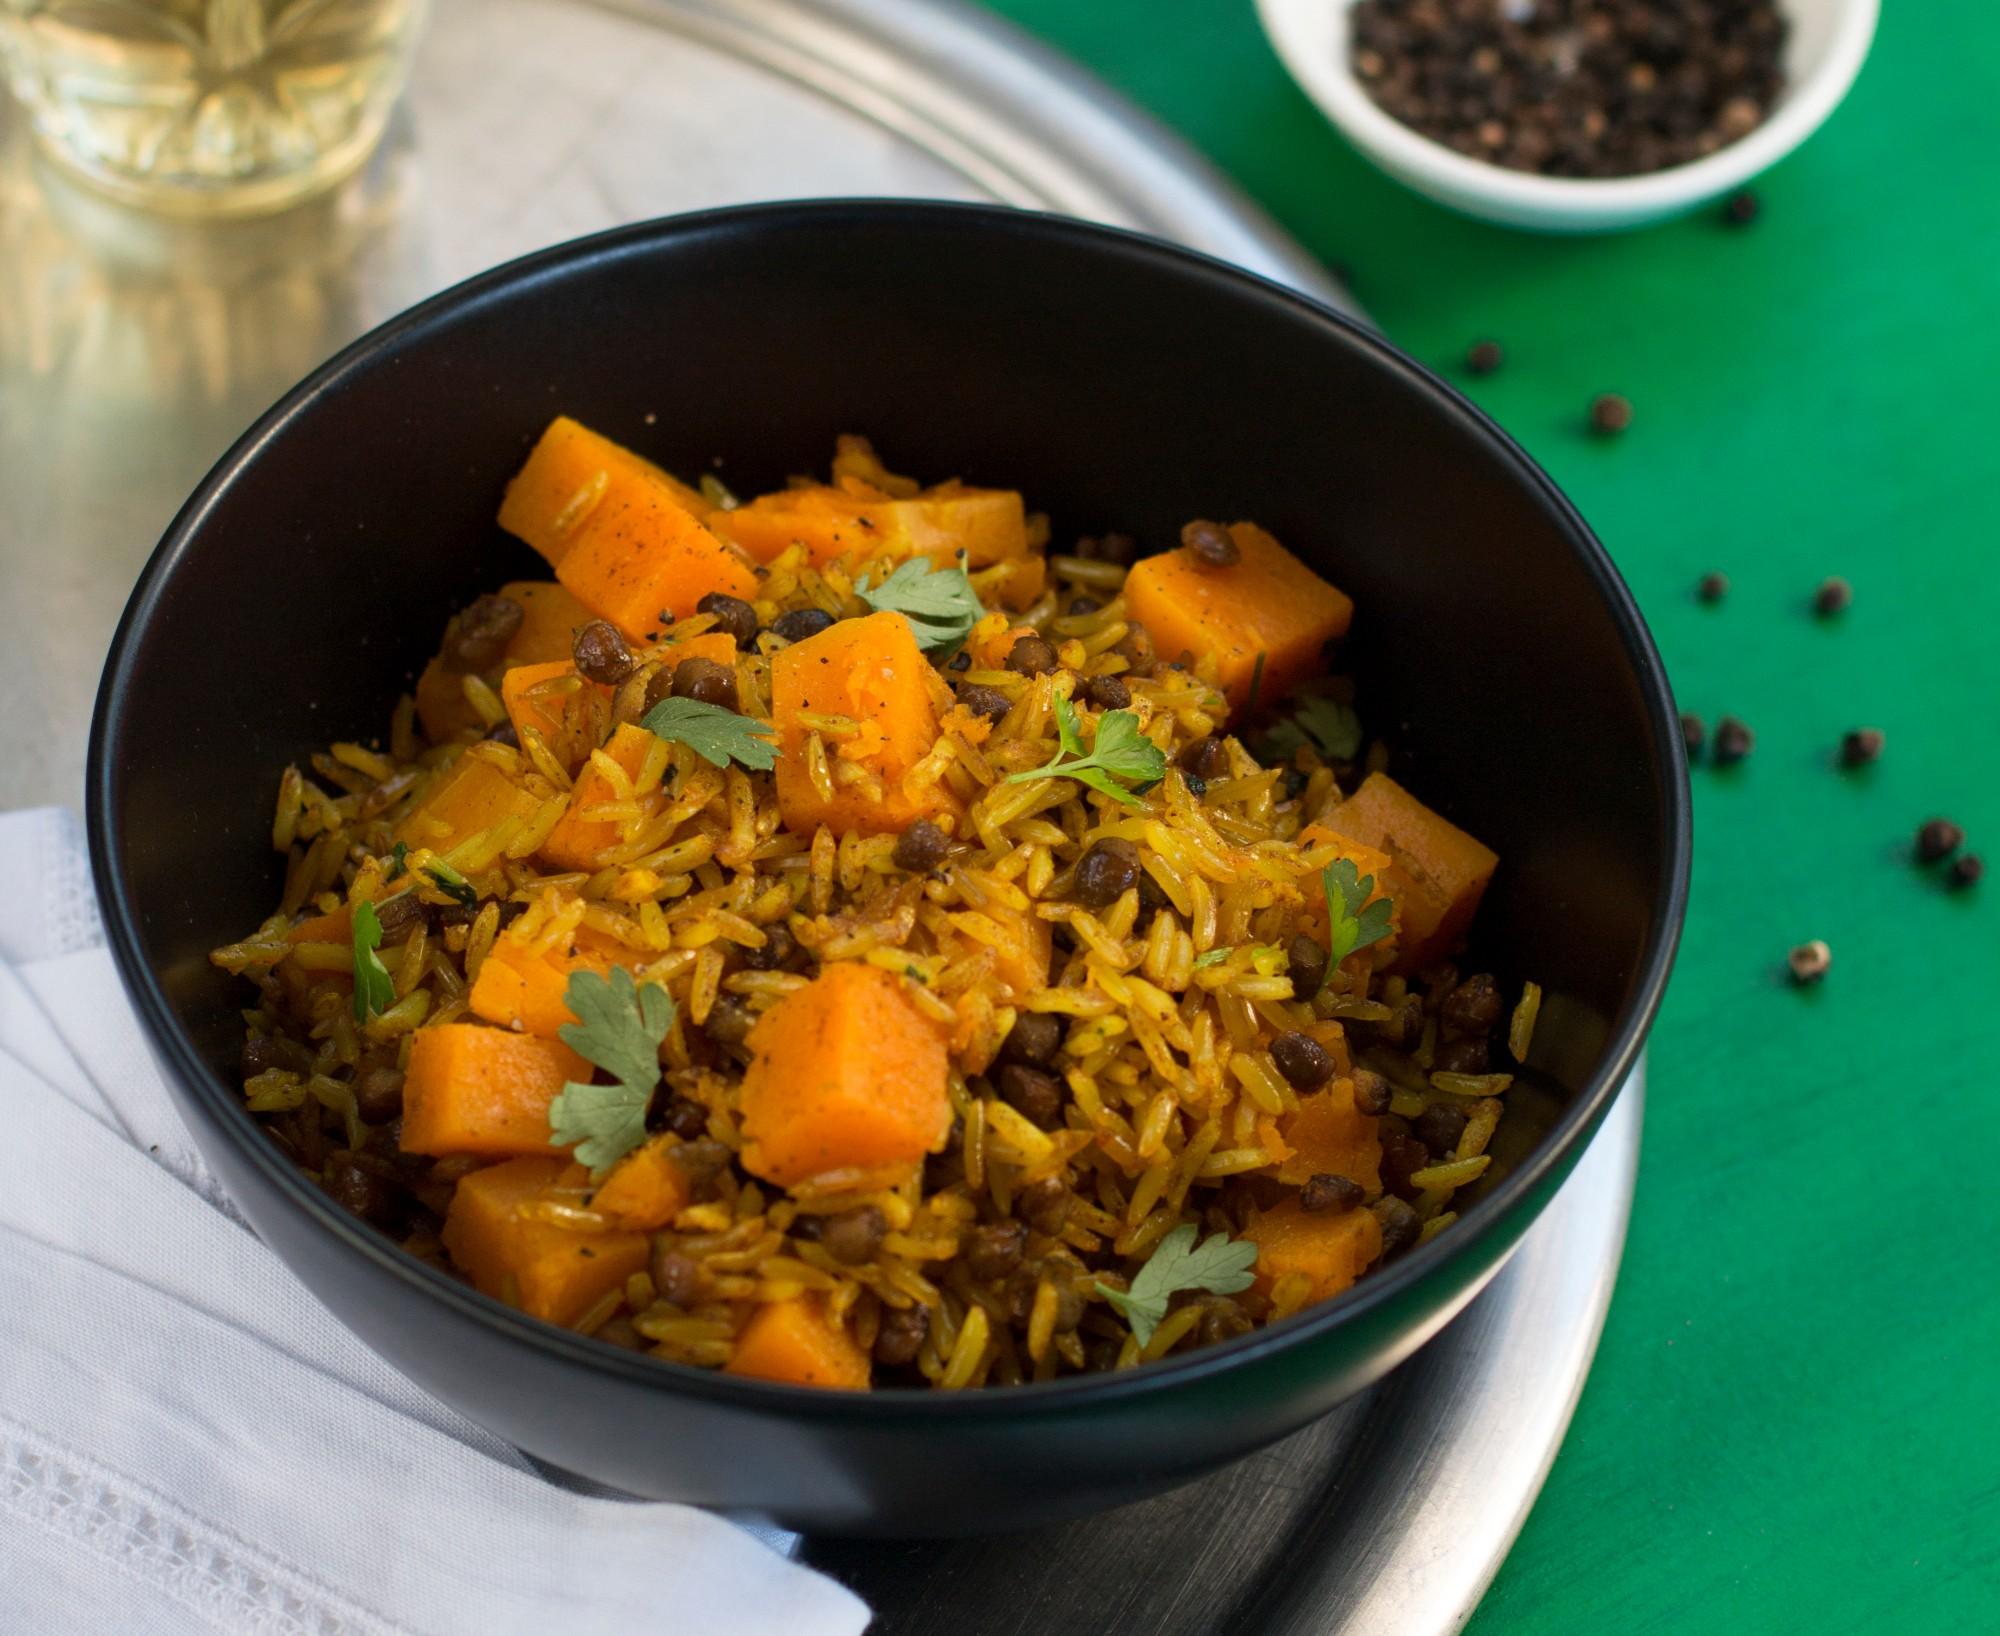 Pure South Press Avocado Macadamia Oil Rice Lentils Recipe